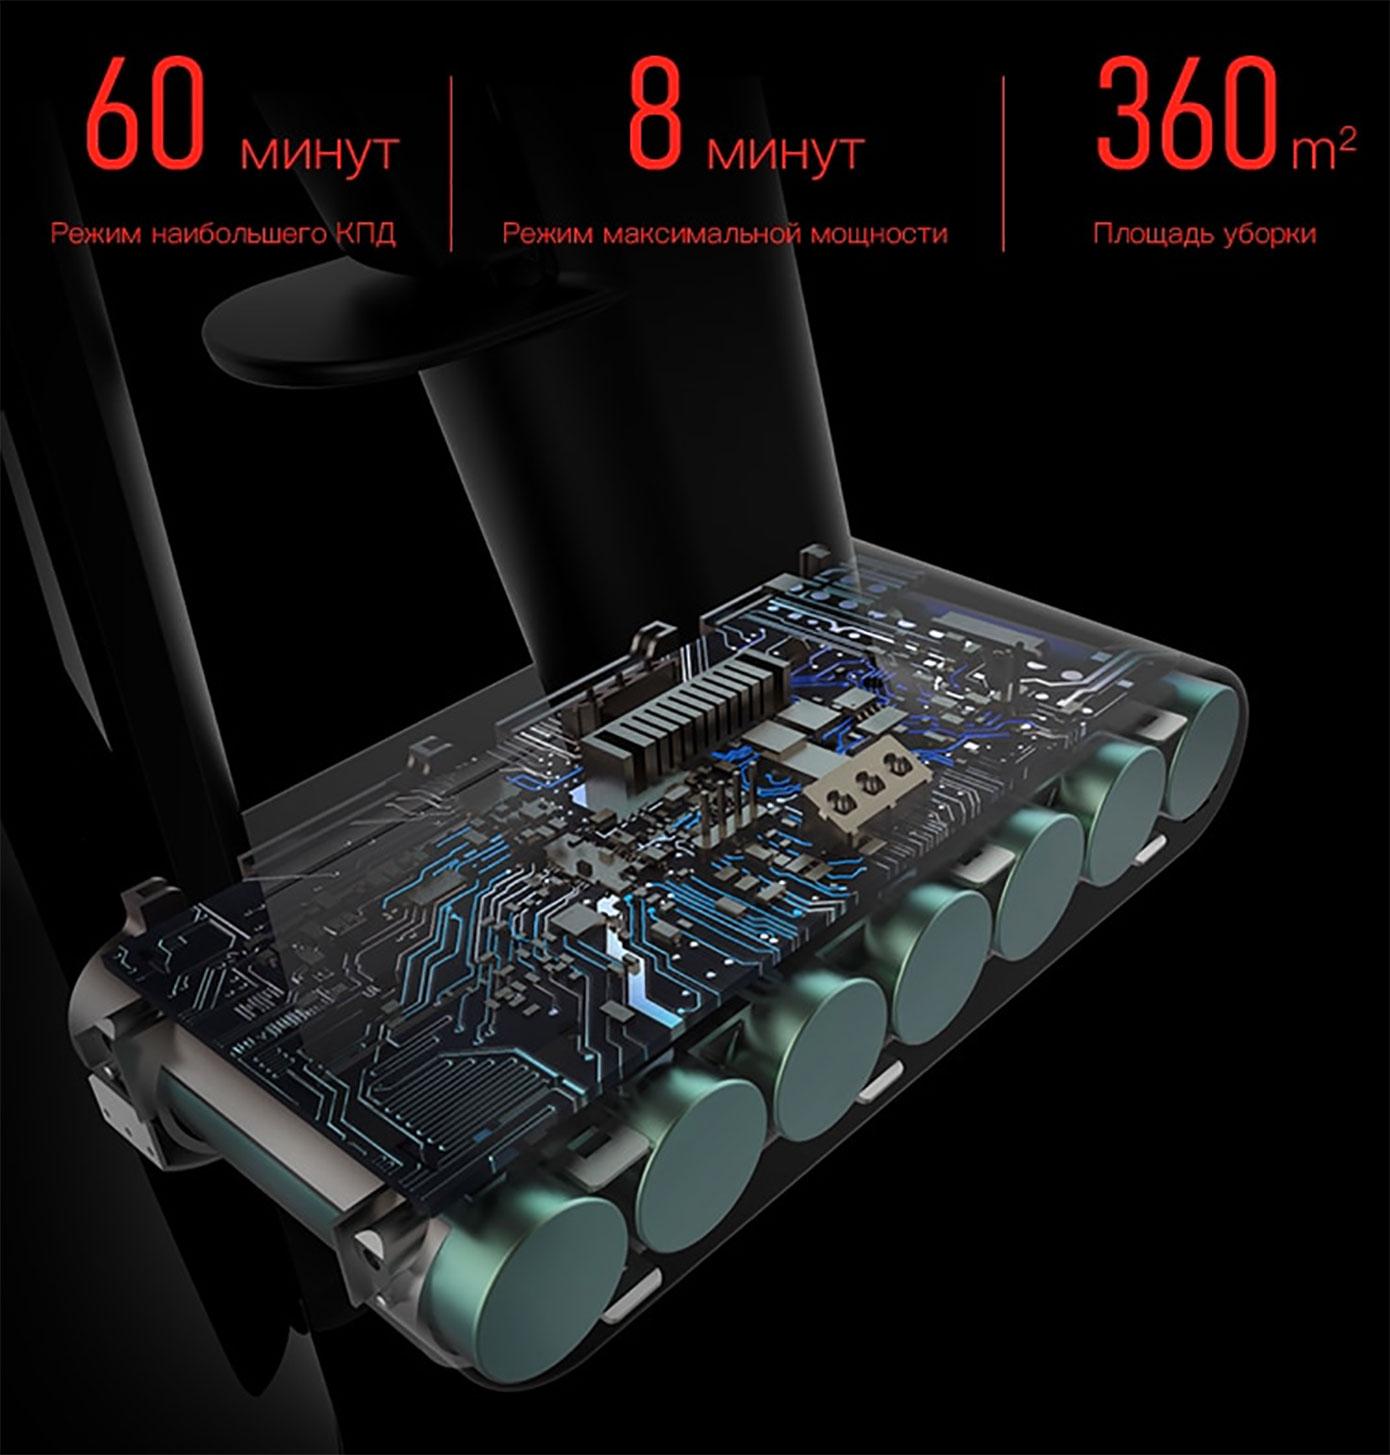 Opisanie Besprovodnoj Ruchnoj Pylesos Xiaomi Dreame V9p Wireless Vacuum Cleaner 01